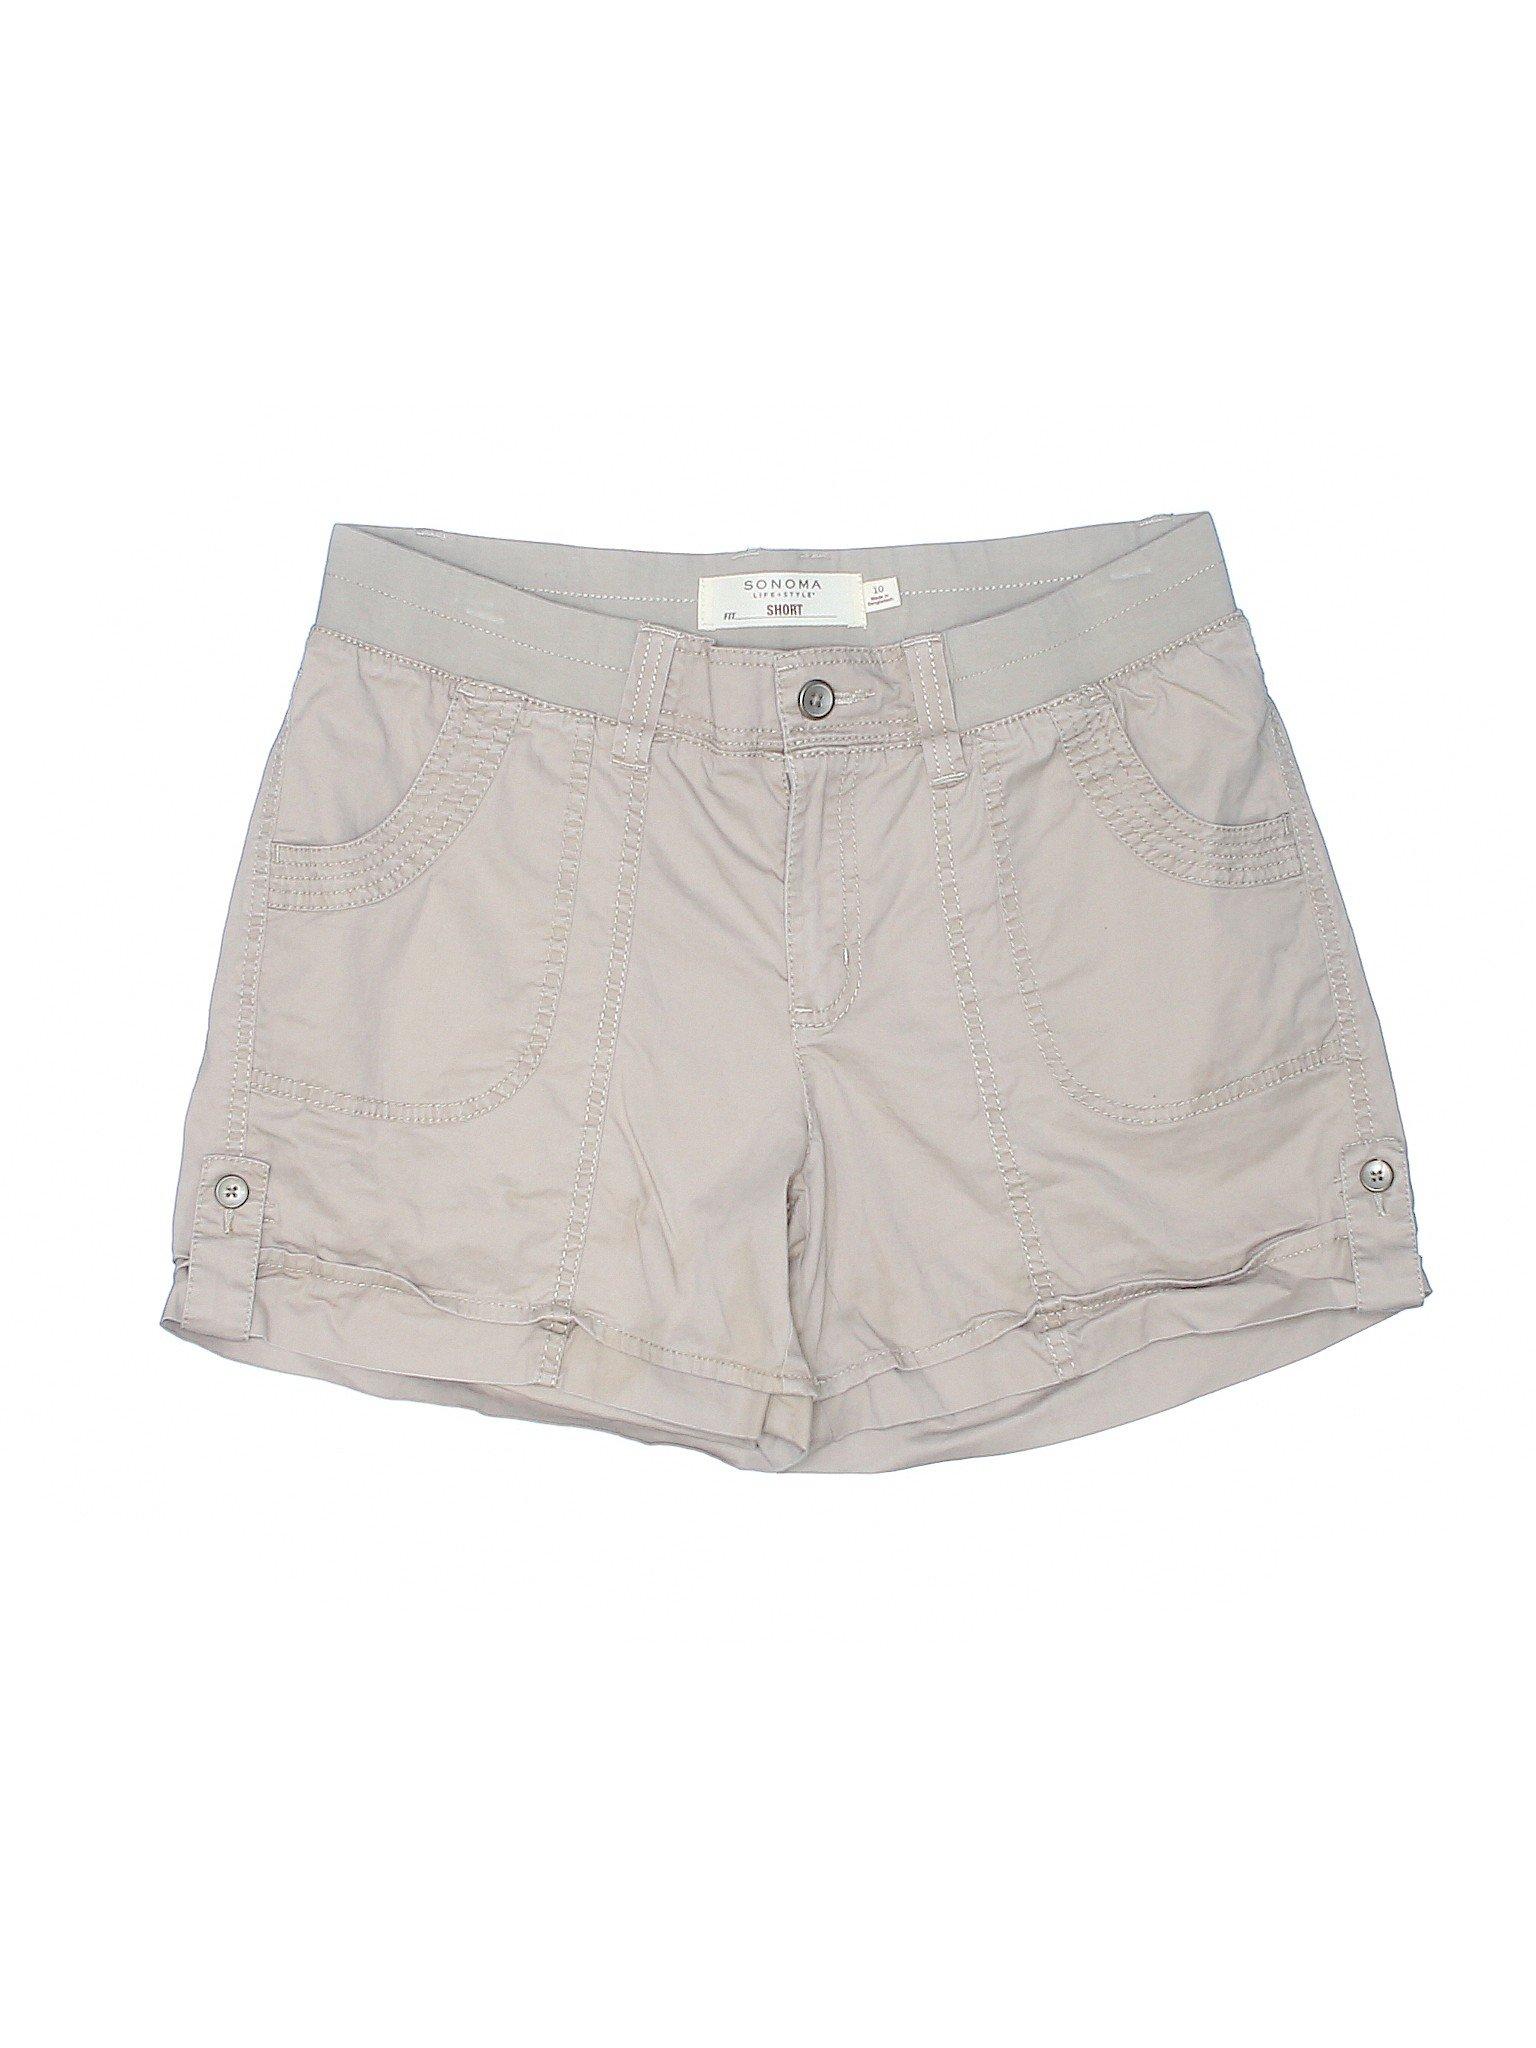 Shorts Boutique SONOMA Khaki style life dRrxn8qIwr